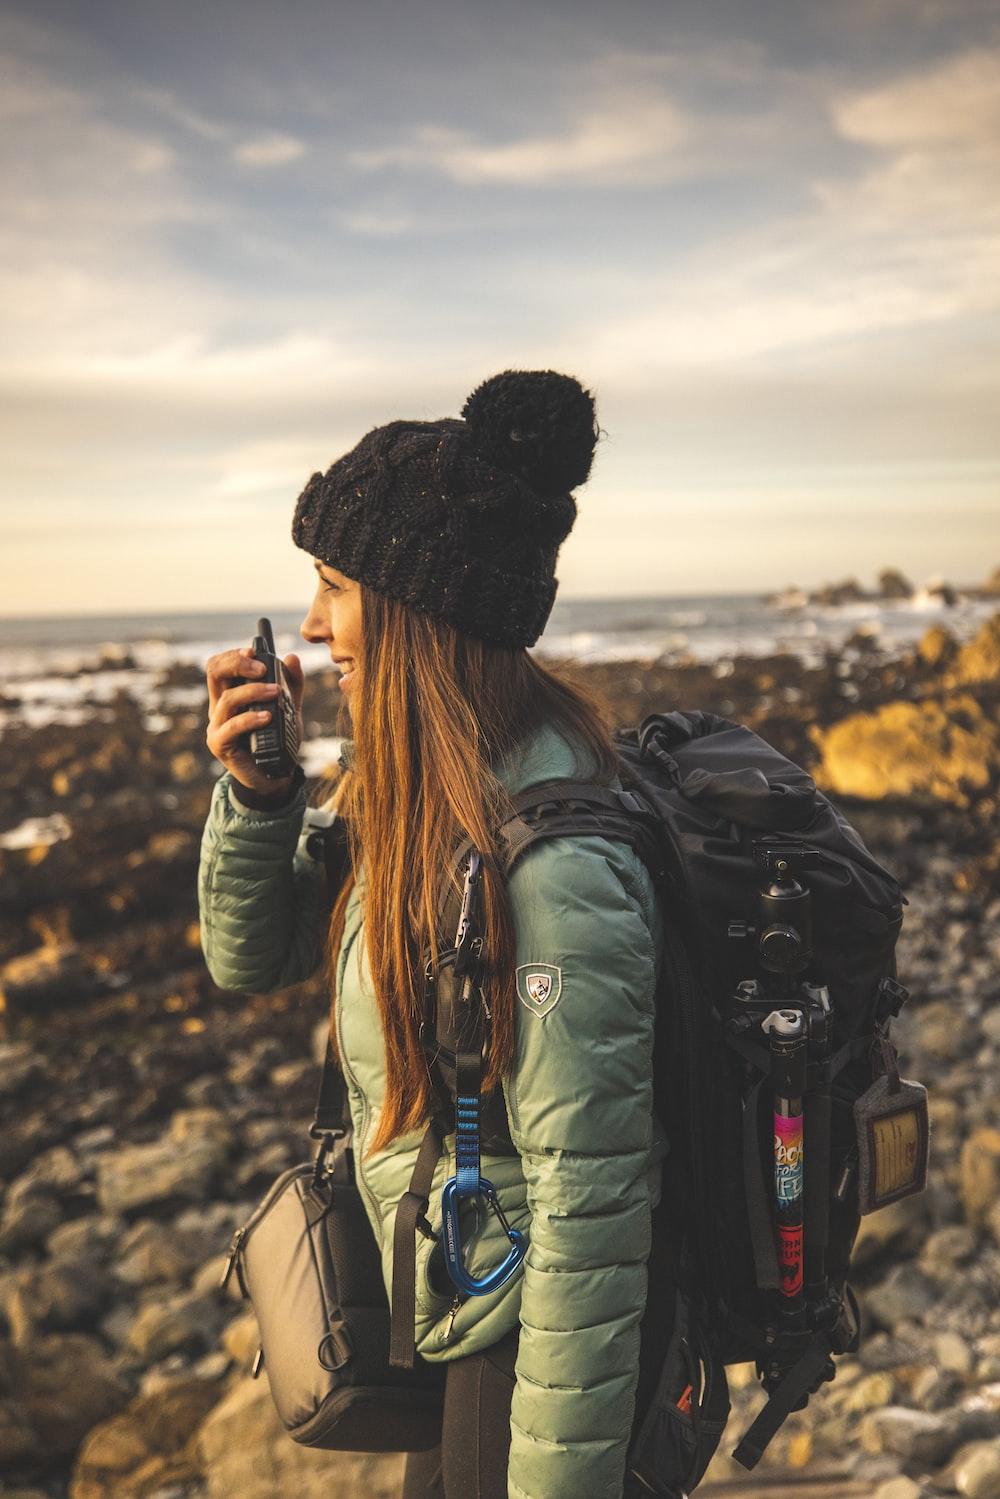 woman in green jacket holding black dslr camera